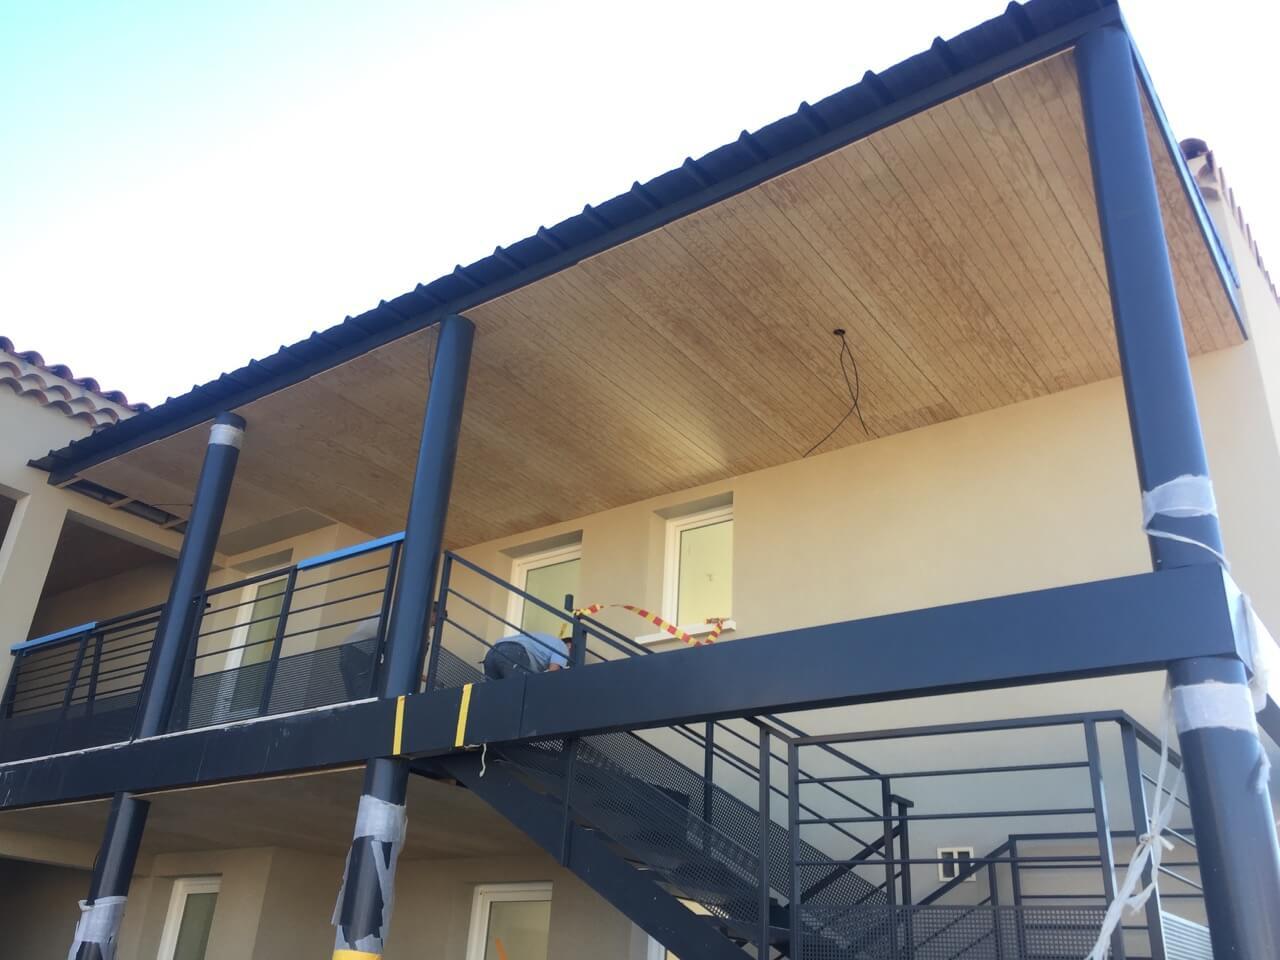 residence barattes étage